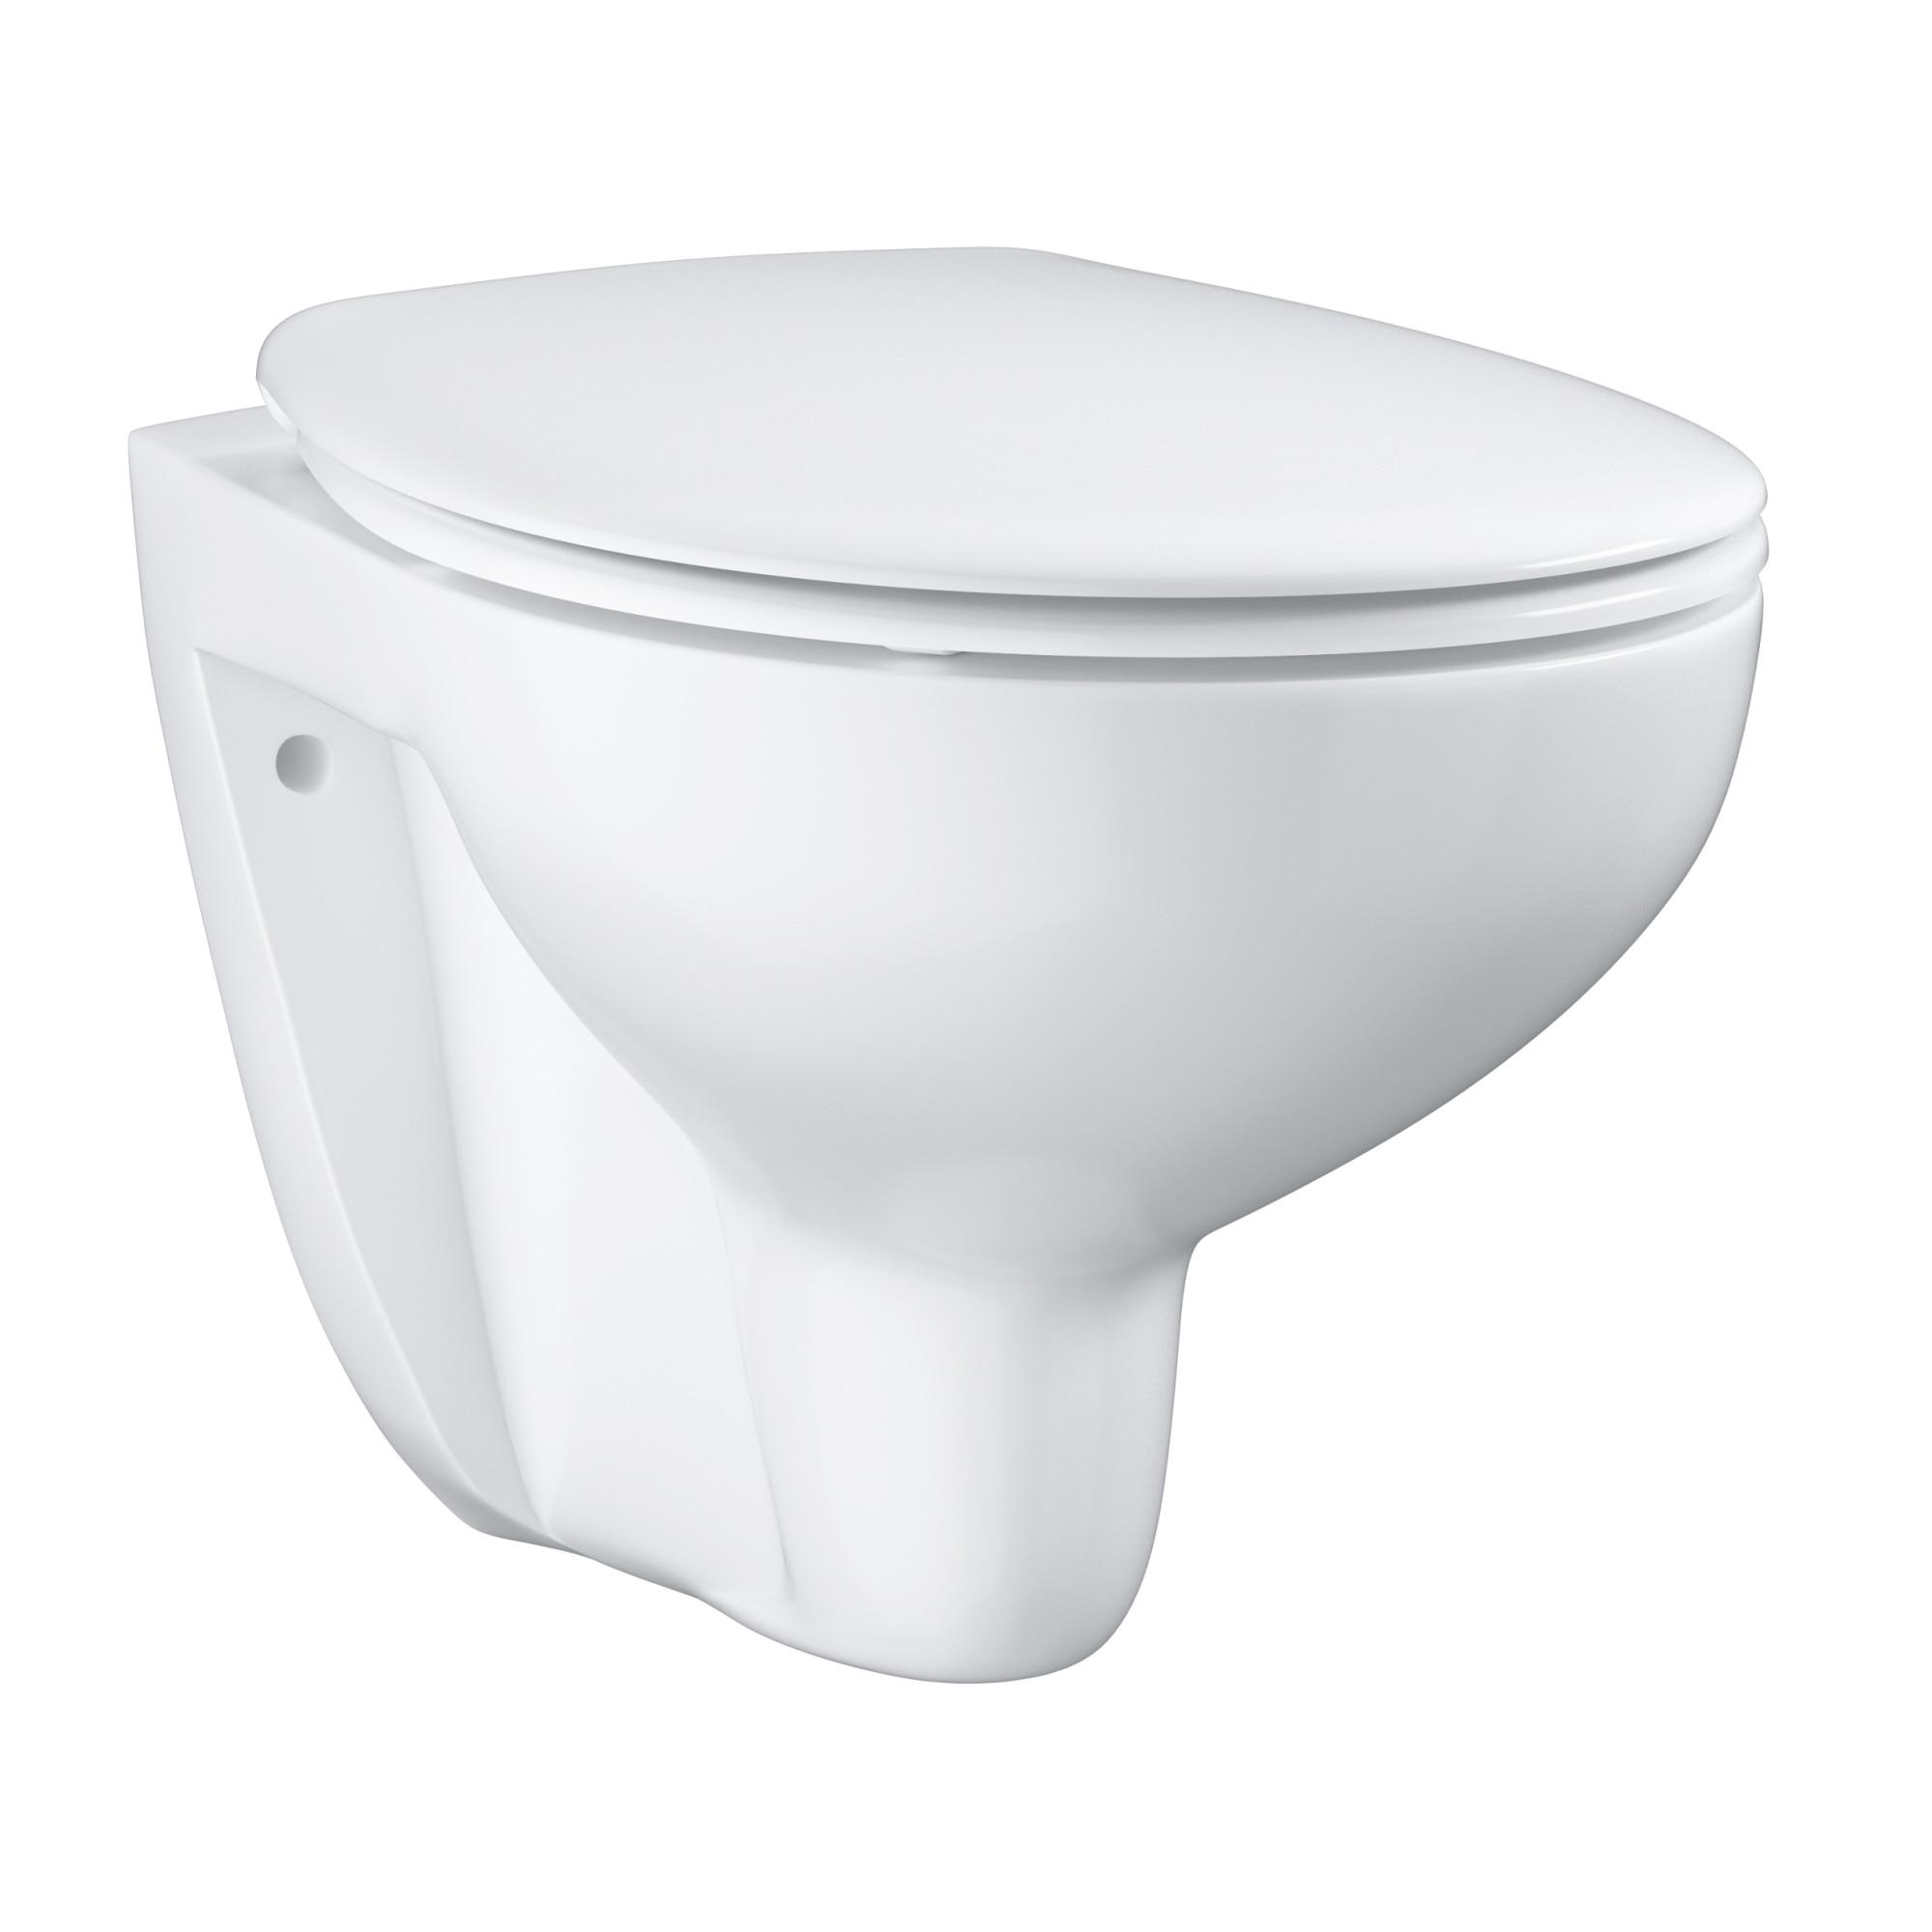 Fotografie Set Vas WC Grohe Bau 39351000, include capac SoftClose, montare suspendata, Rimless, evacuare orizontala, clatire prin jet apa, Alb